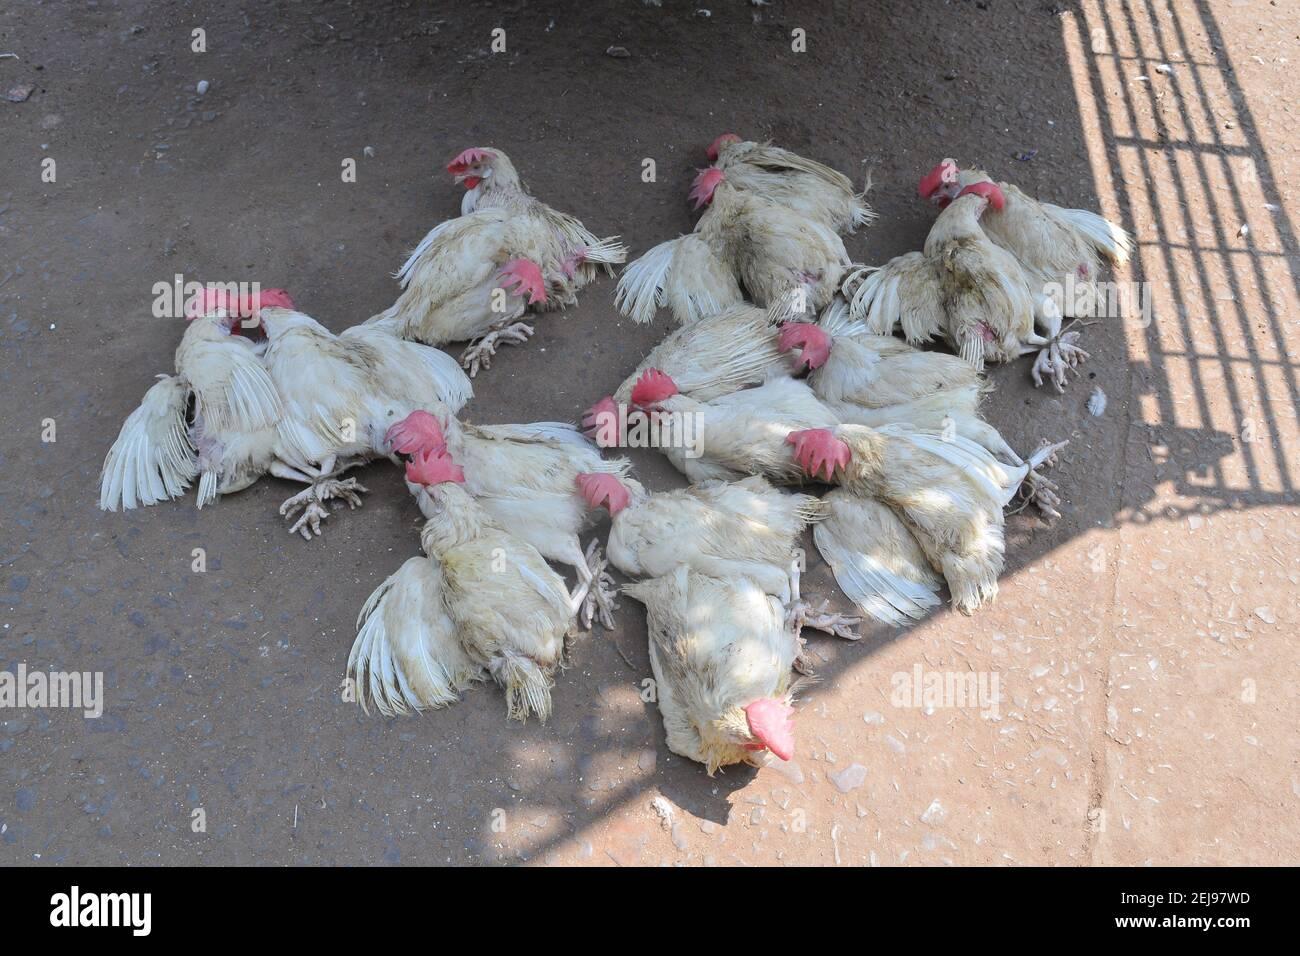 Jagdalpur- animal abuse market in Chhattisgarh-India Stock Photo